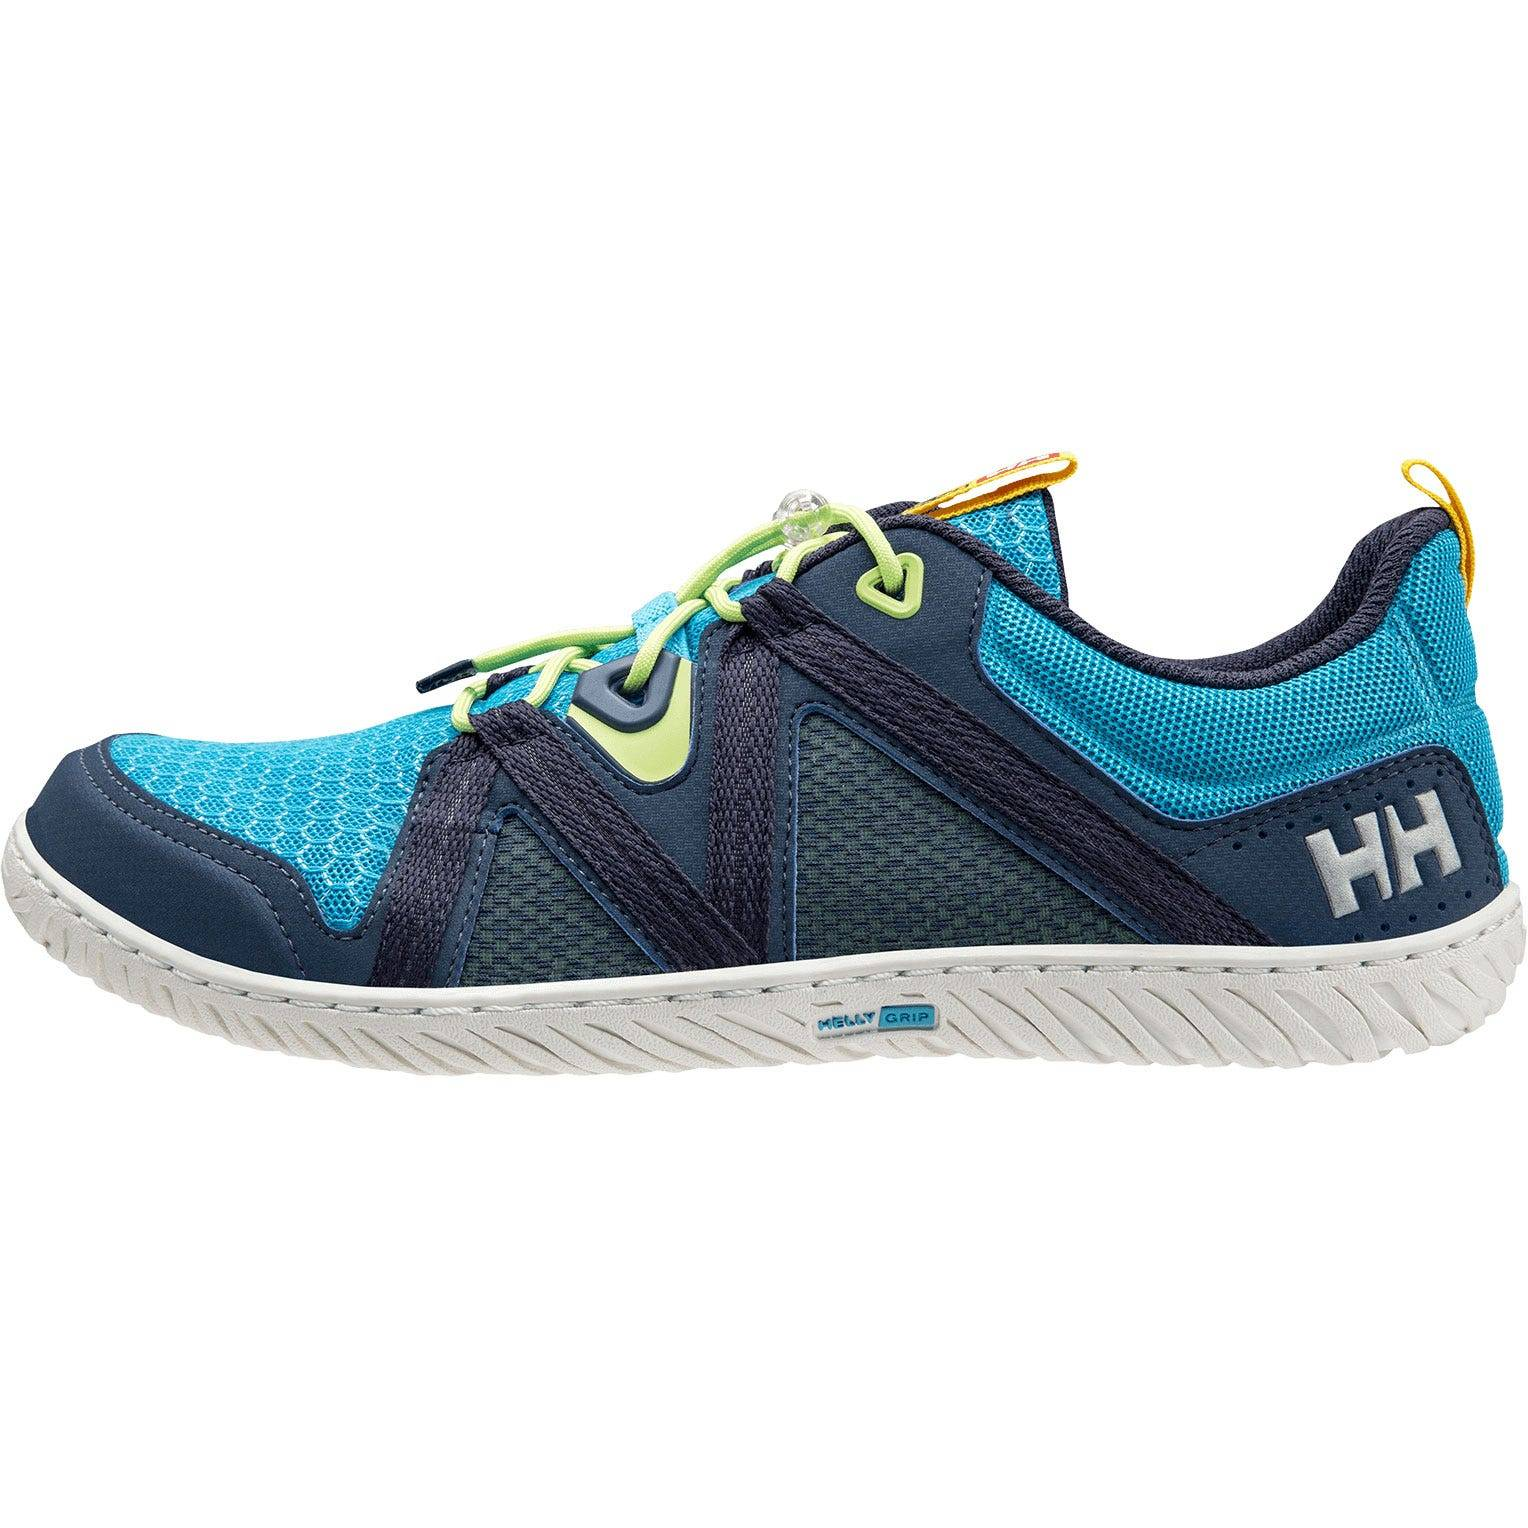 Helly Hansen W Hp Foil F1 Womens Sailing Shoe Blue 38/7